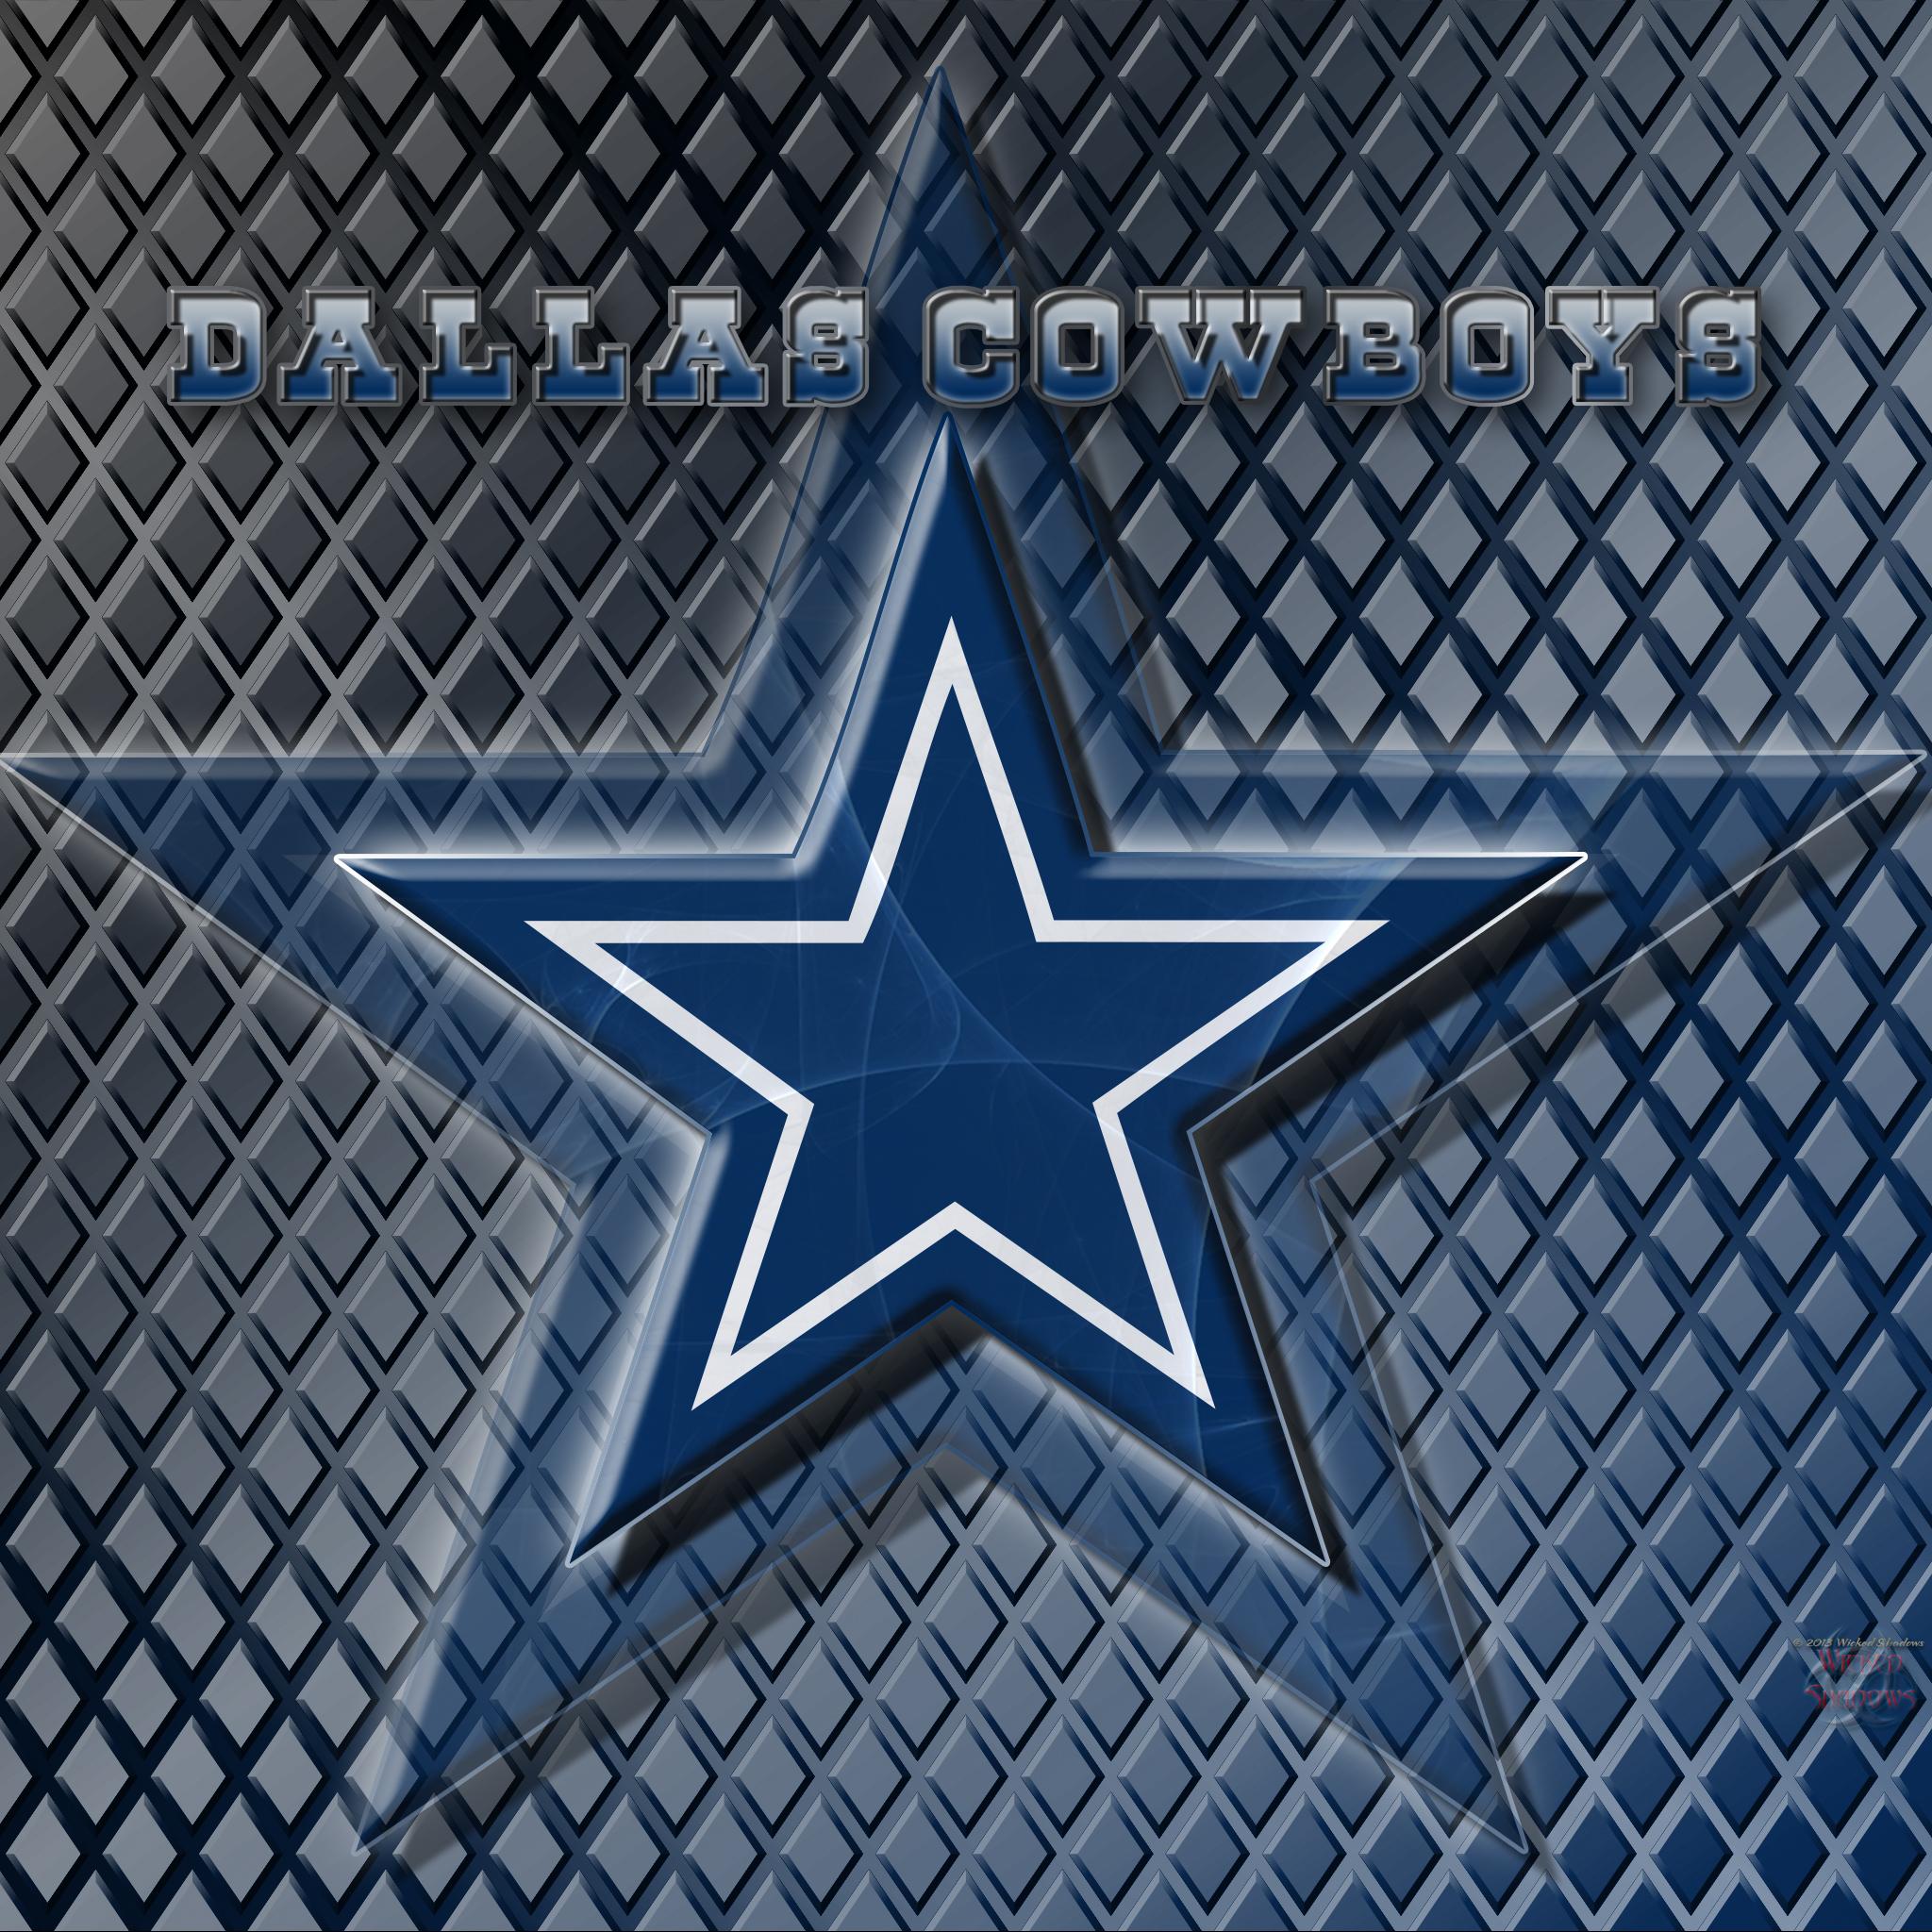 Dallas Cowboys Live Wallpaper: Cowboys Logo Wallpaper